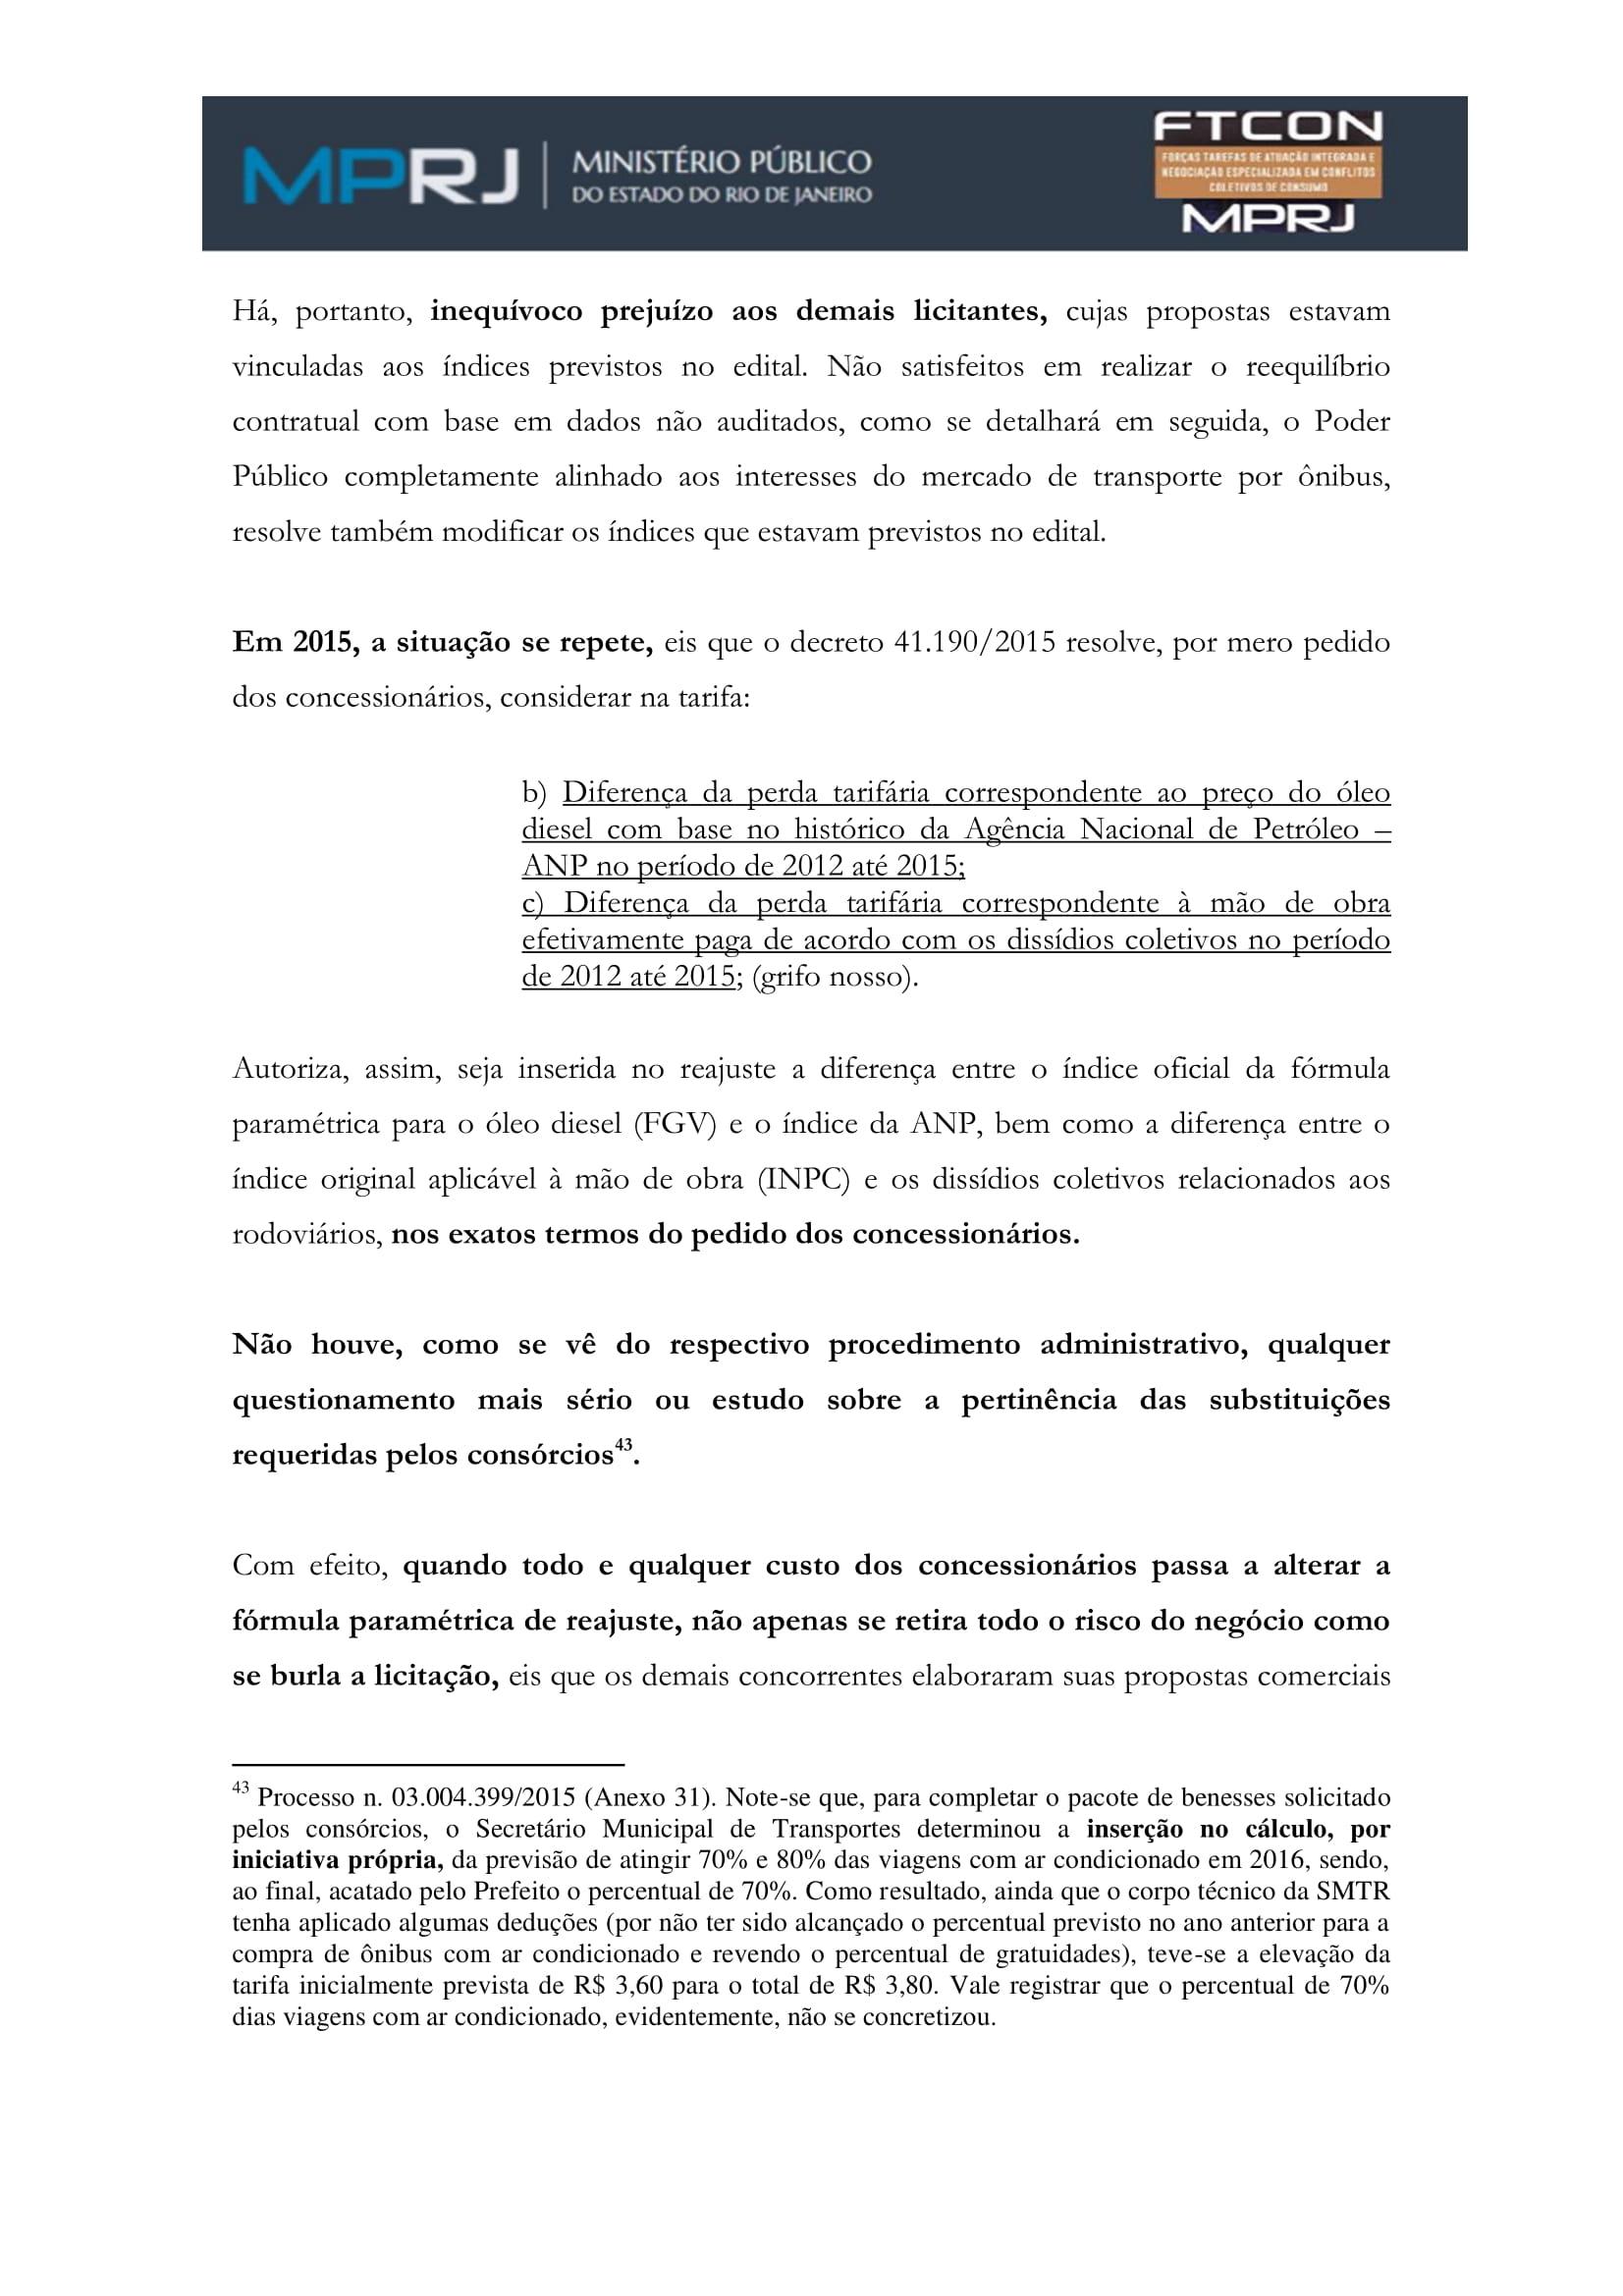 acp_caducidade_onibus_dr_rt-057